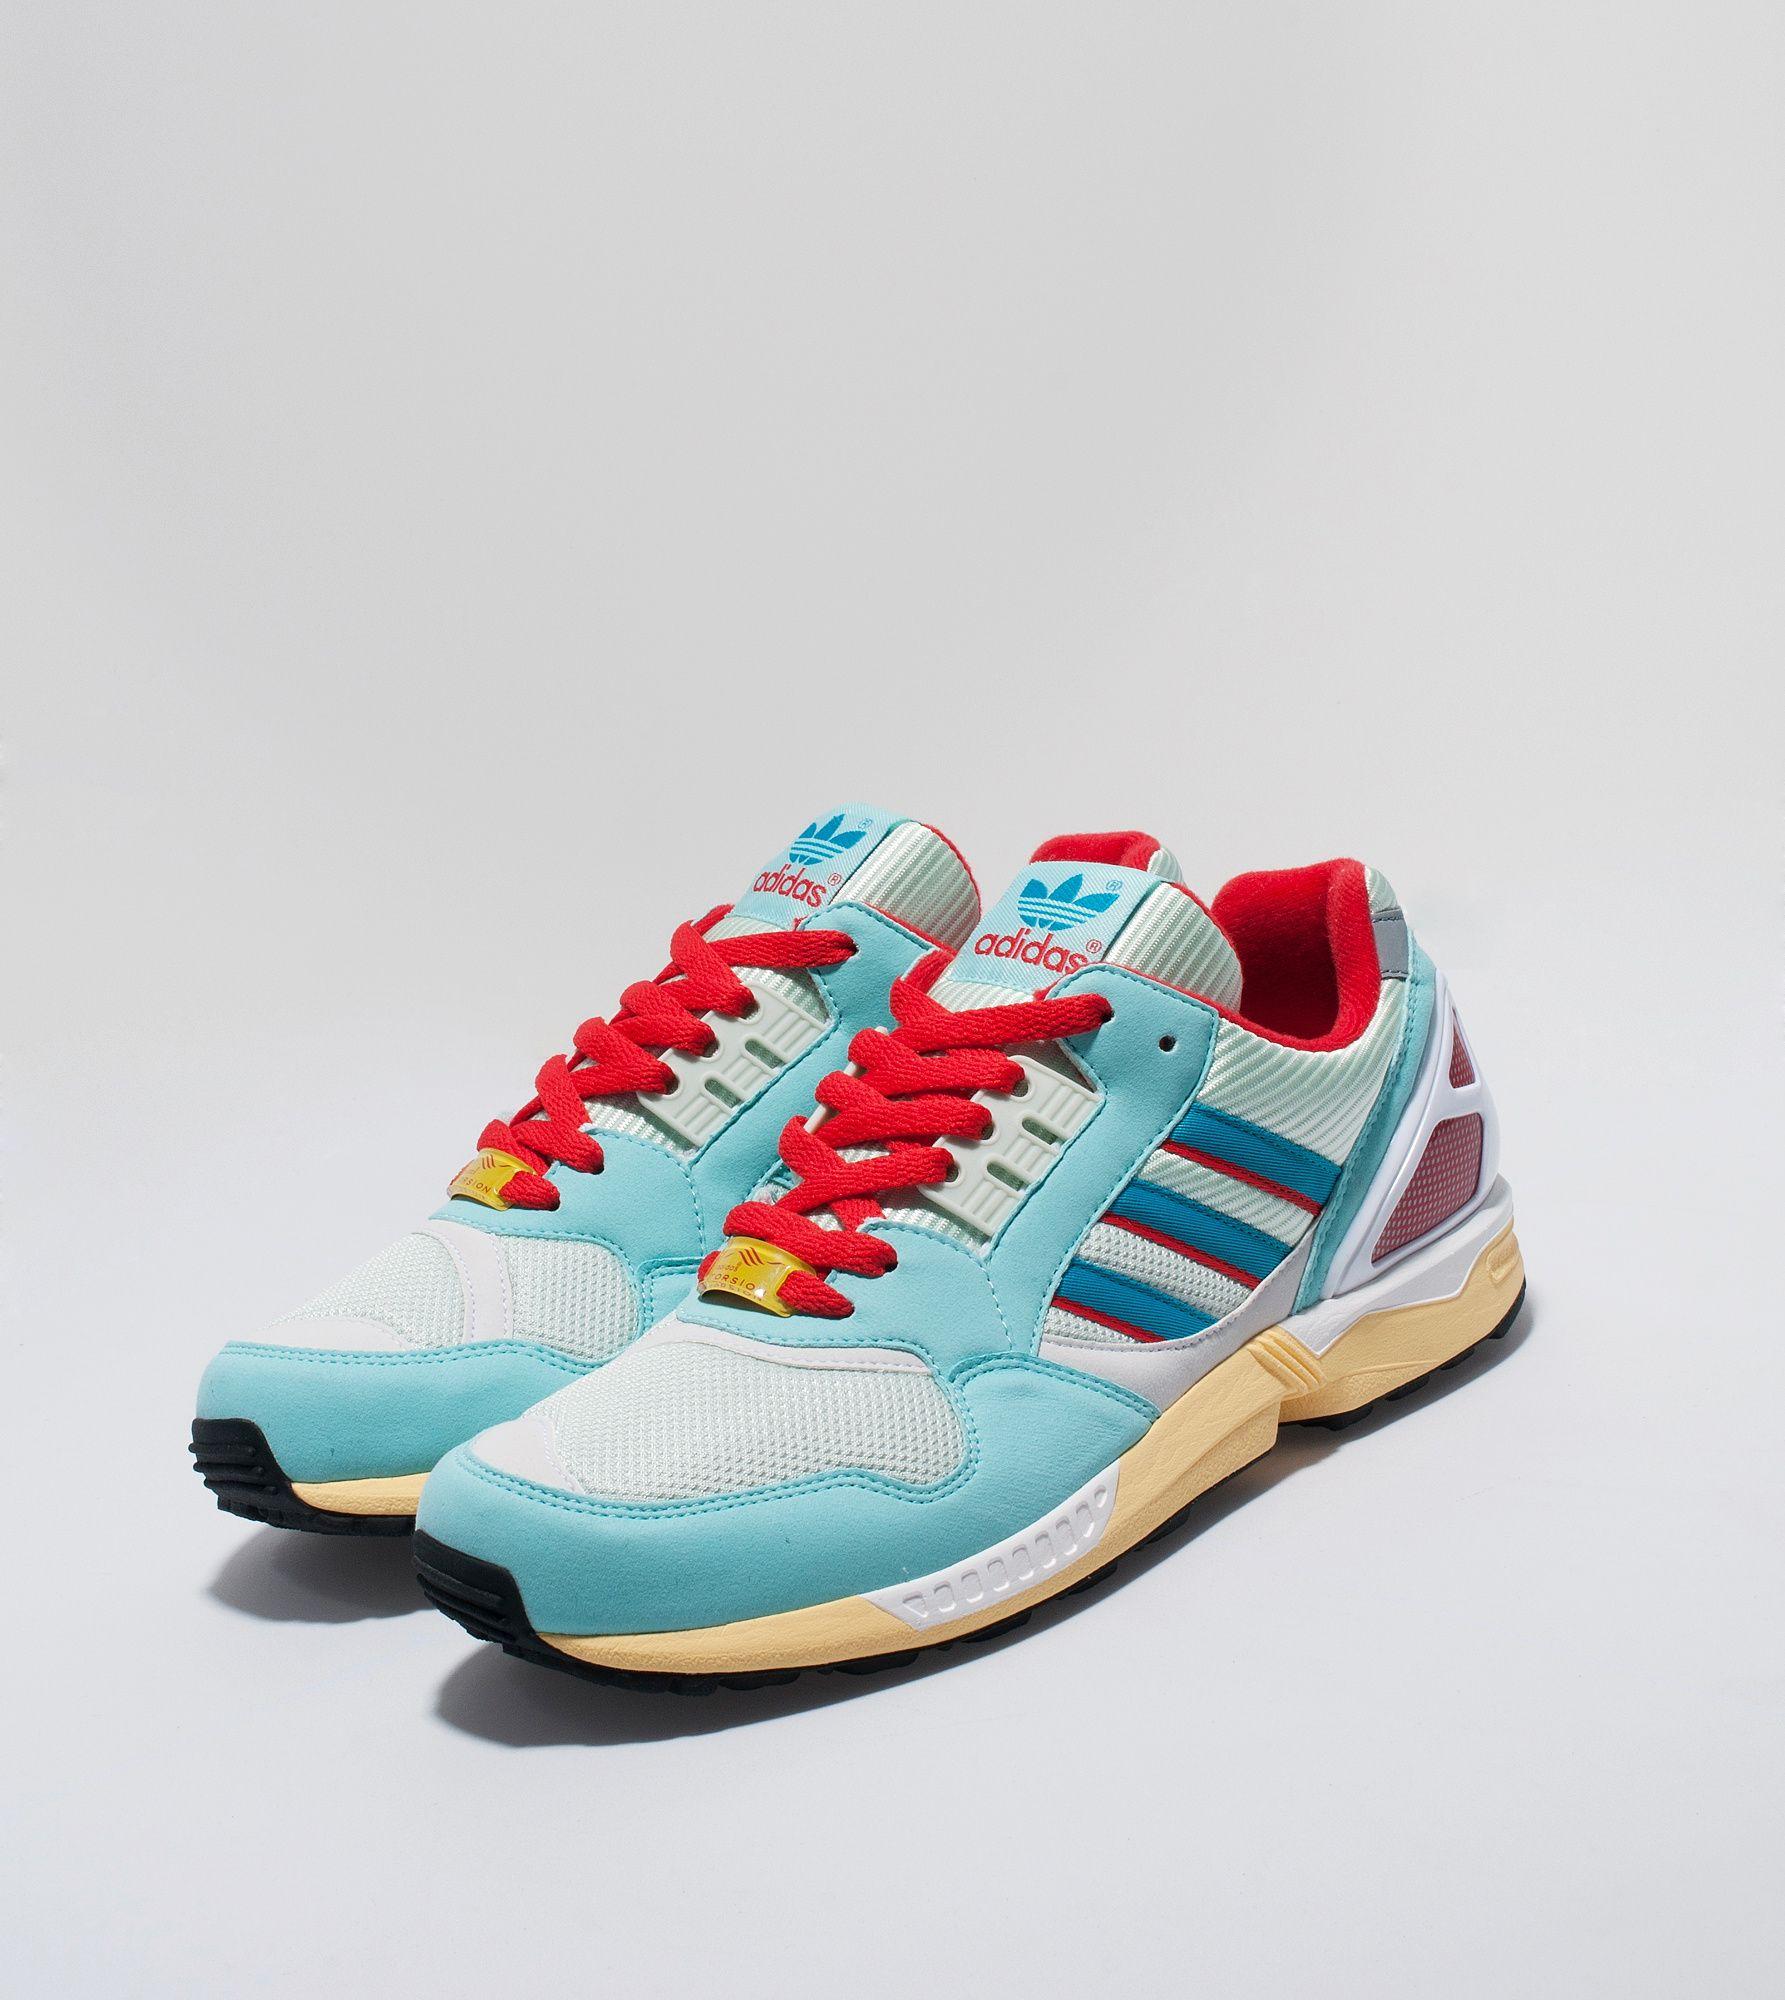 wholesale adidas torsion zx 9000 78131 5b7f6